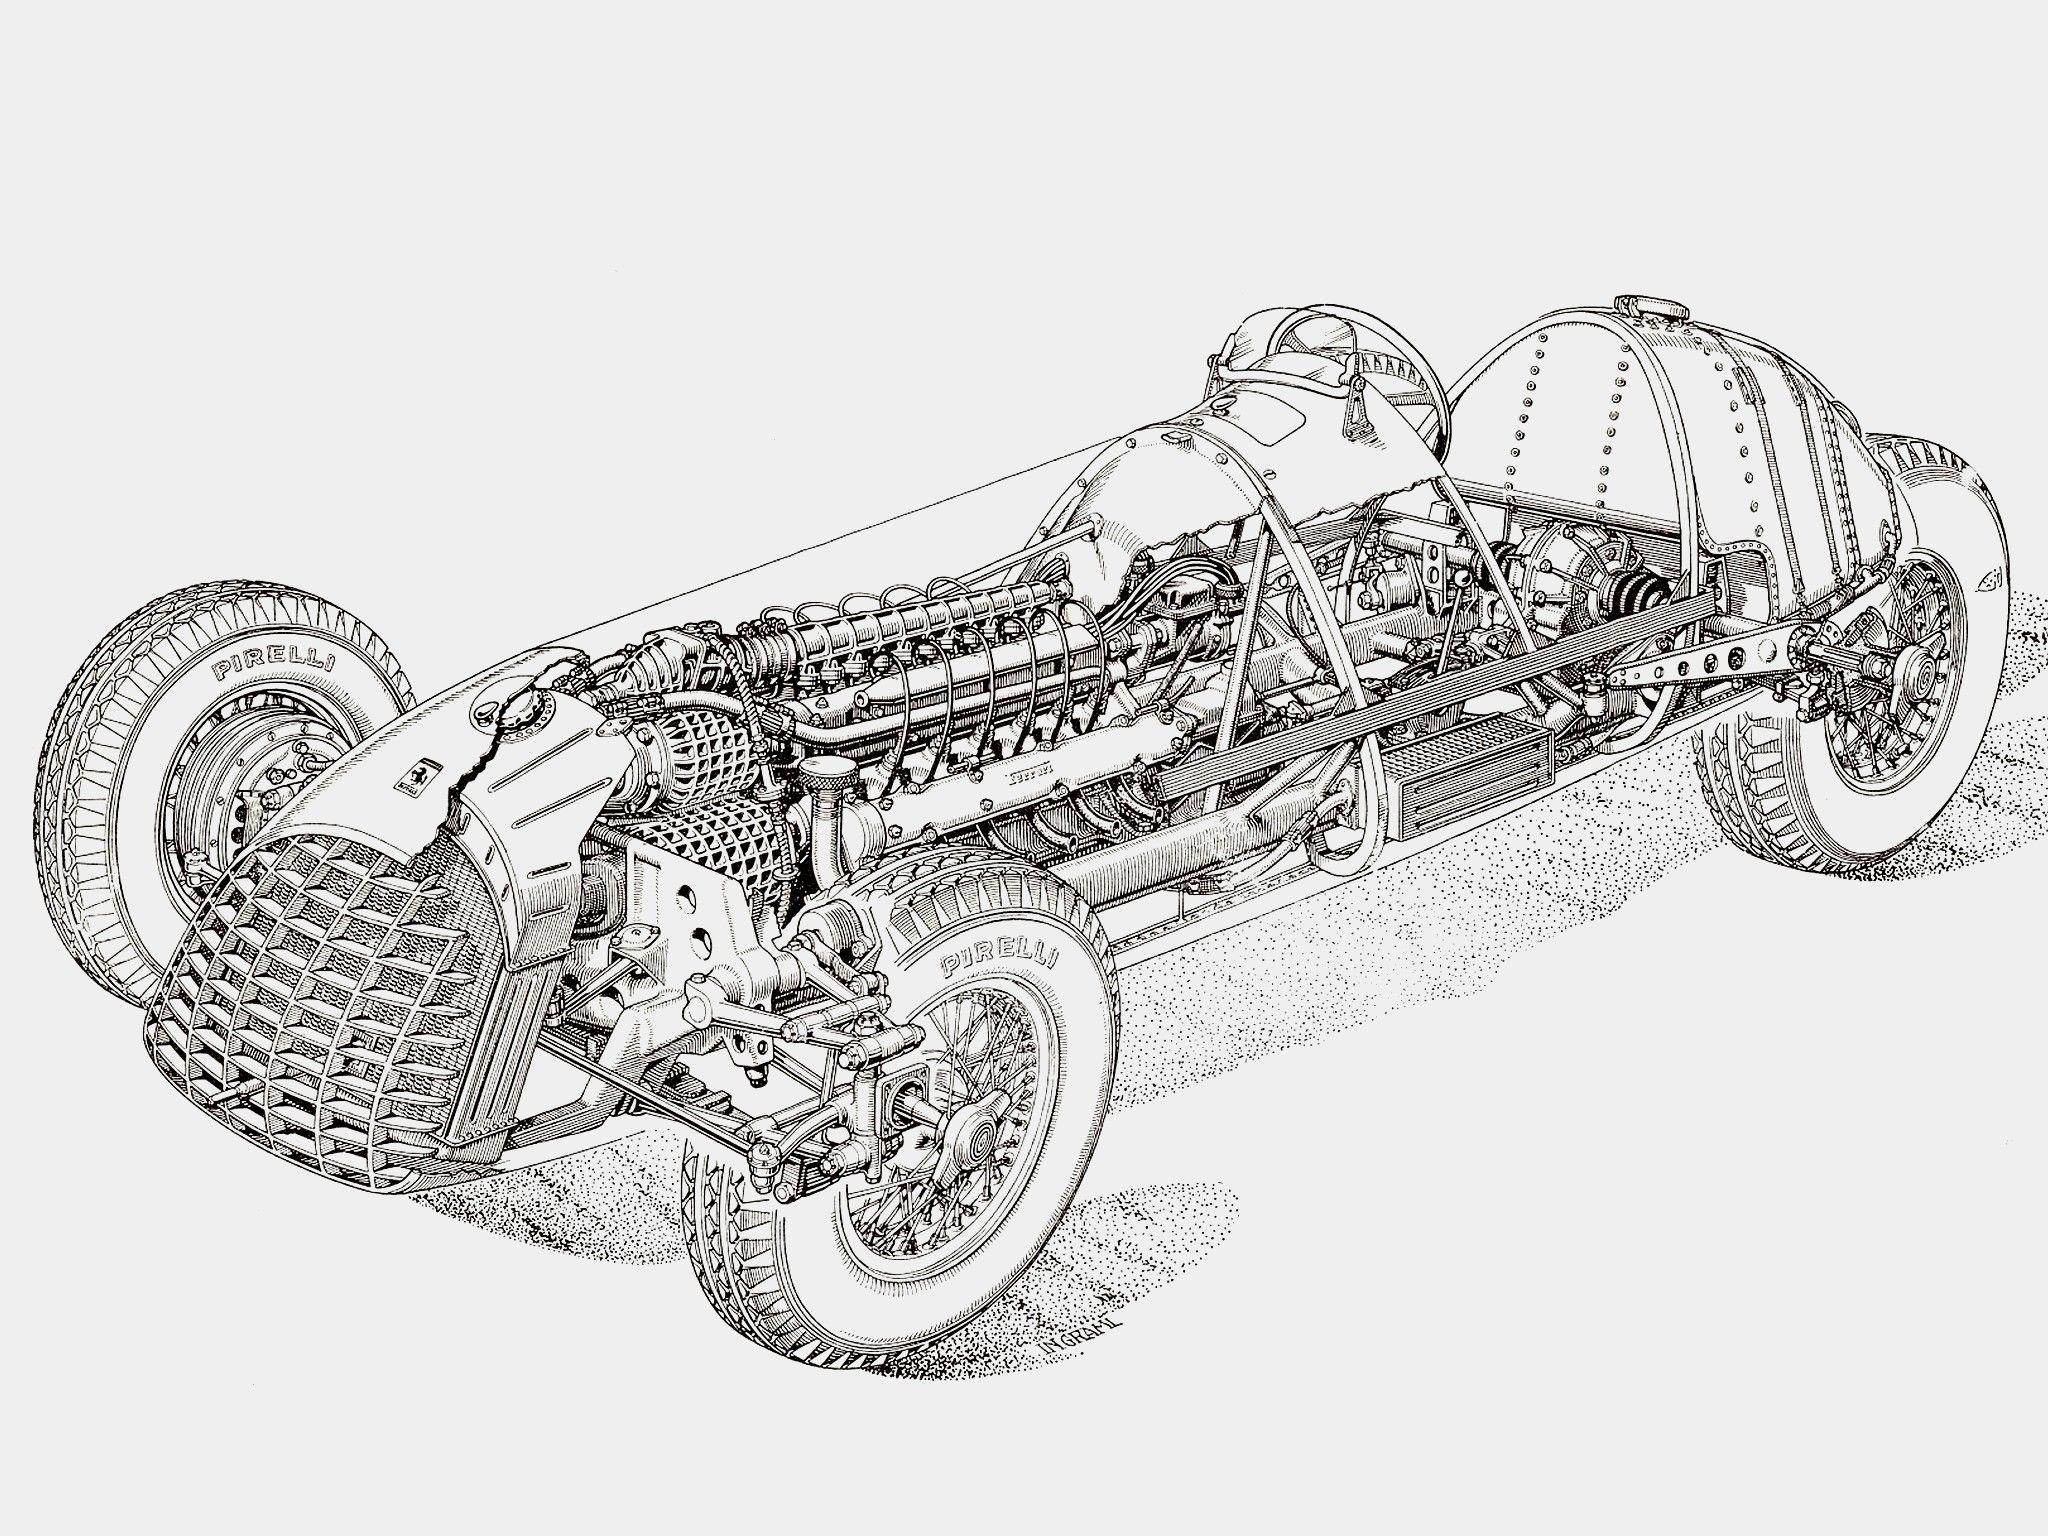 1948 1950 Ferrari 125 Formula Illustrator Uncredited